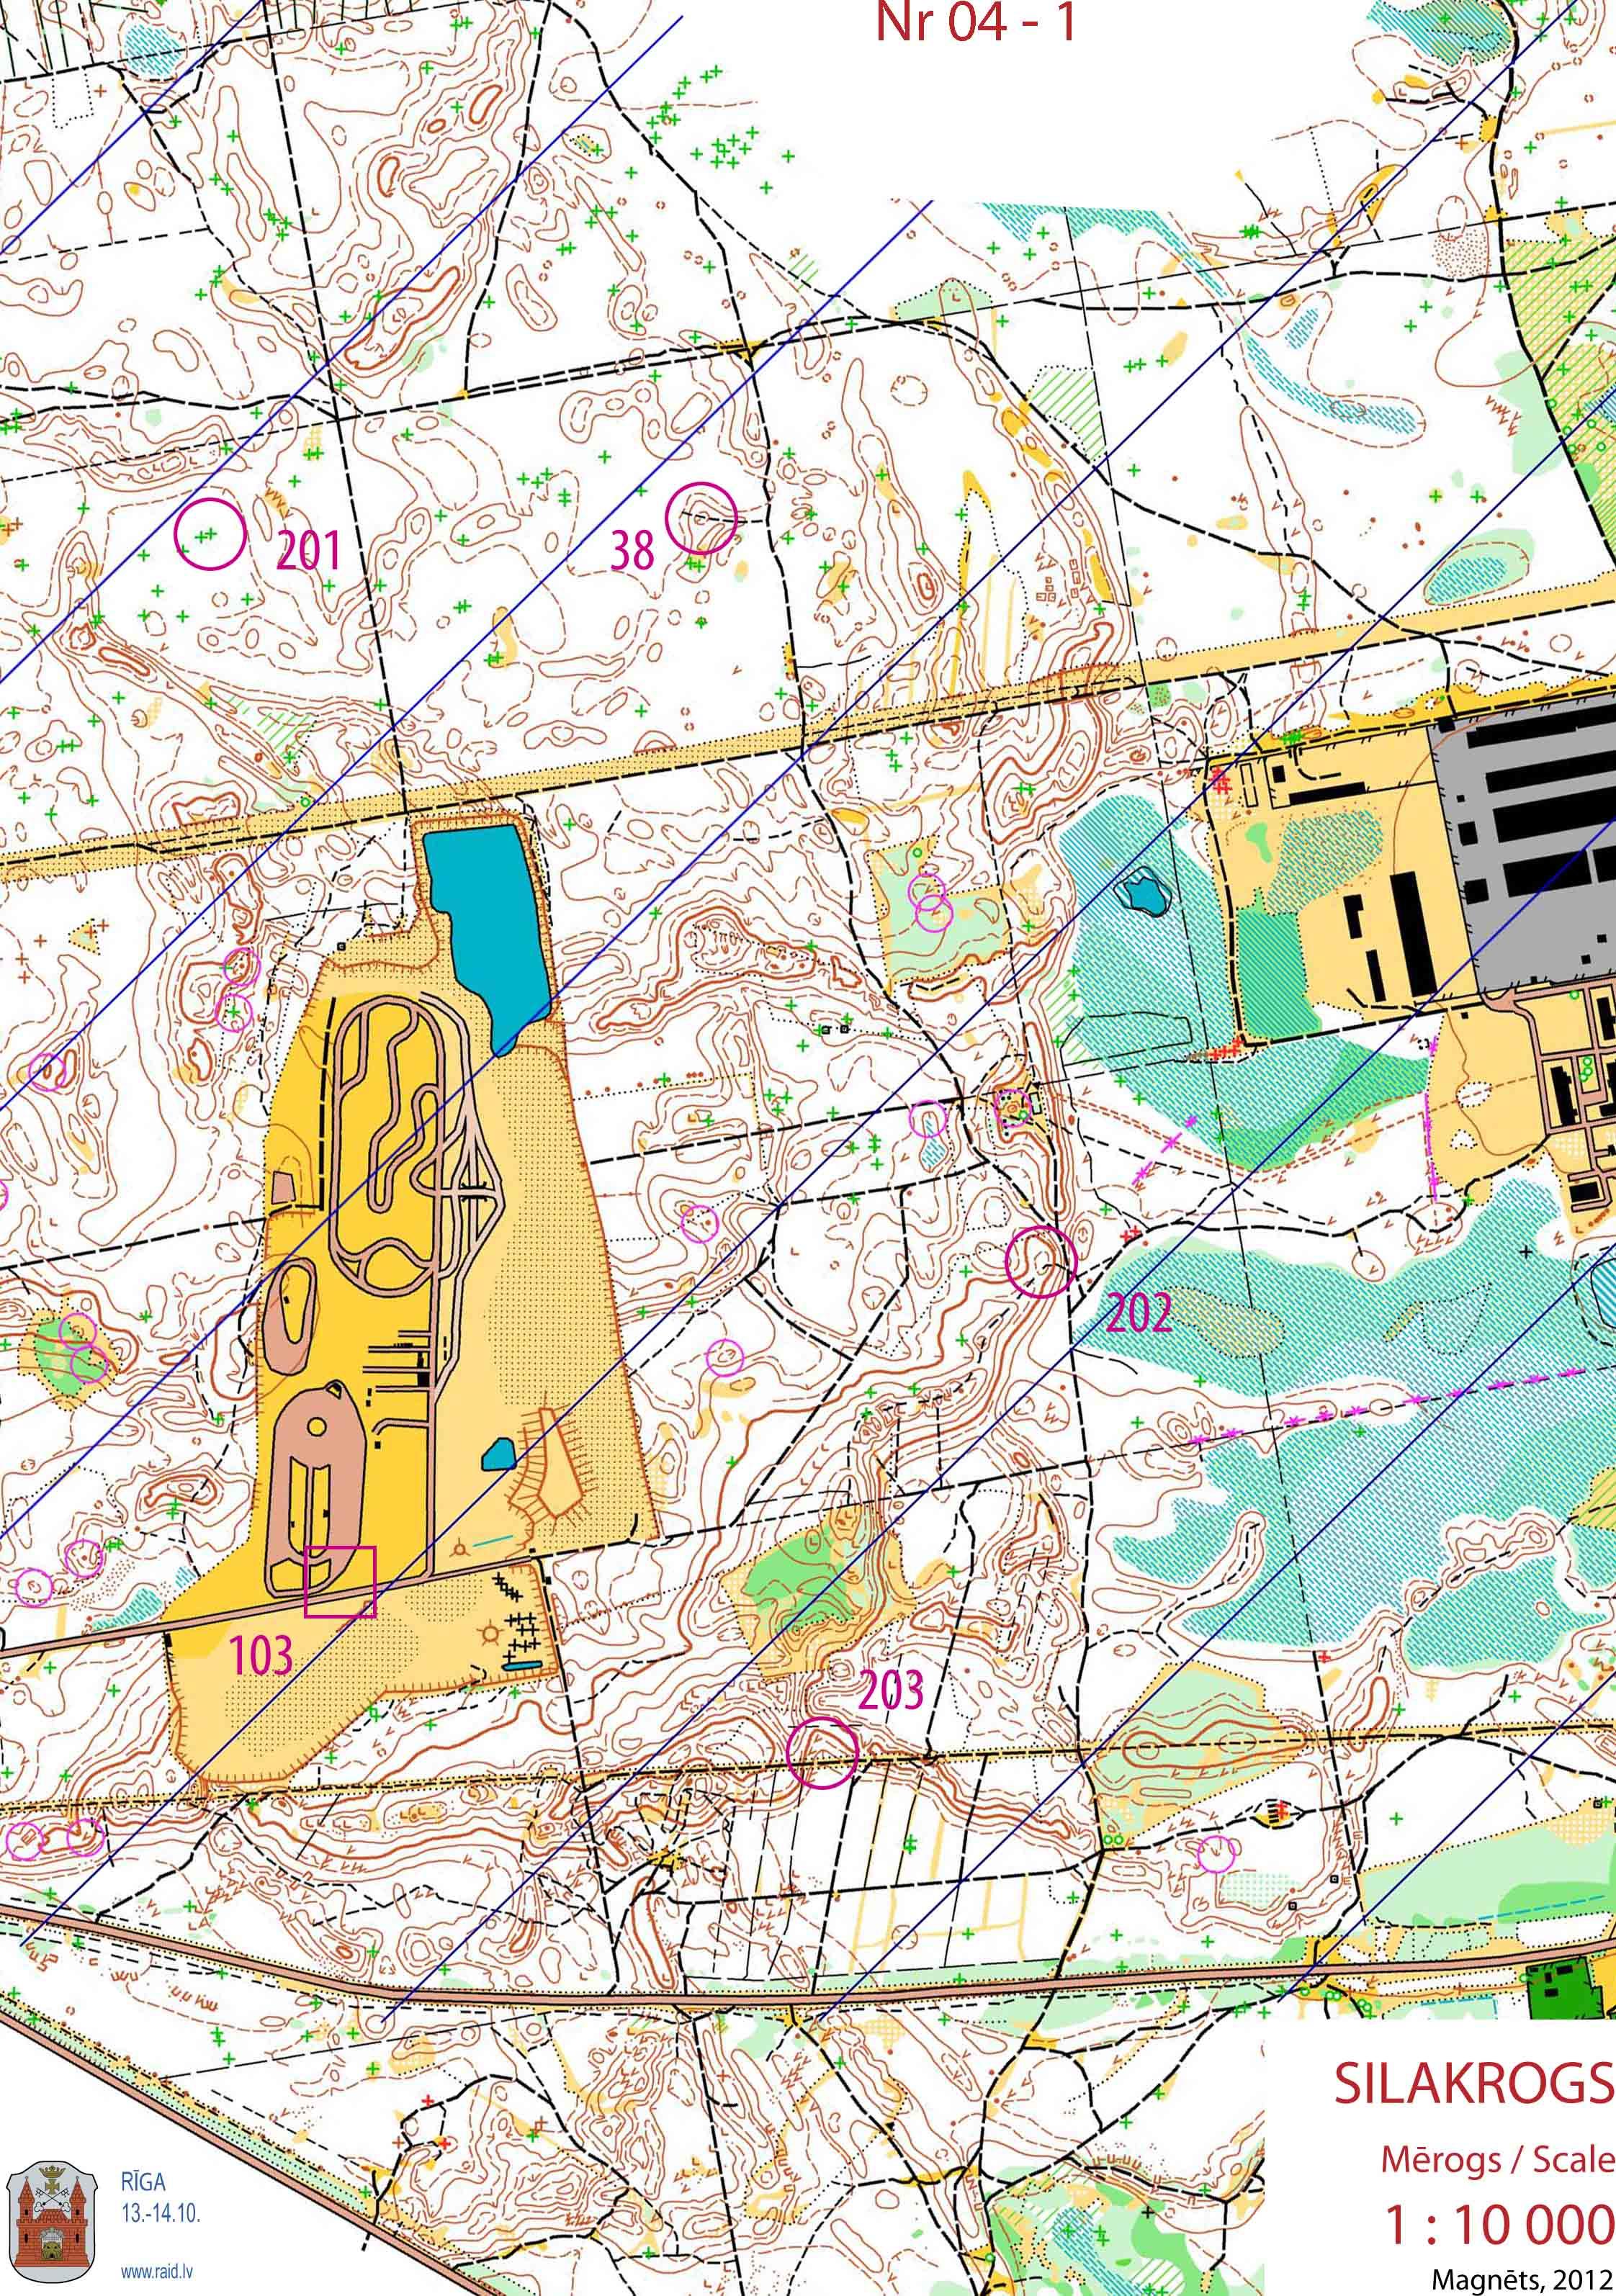 Orientēšanās karte Silakrogs 333 trase mērogs 1:10000